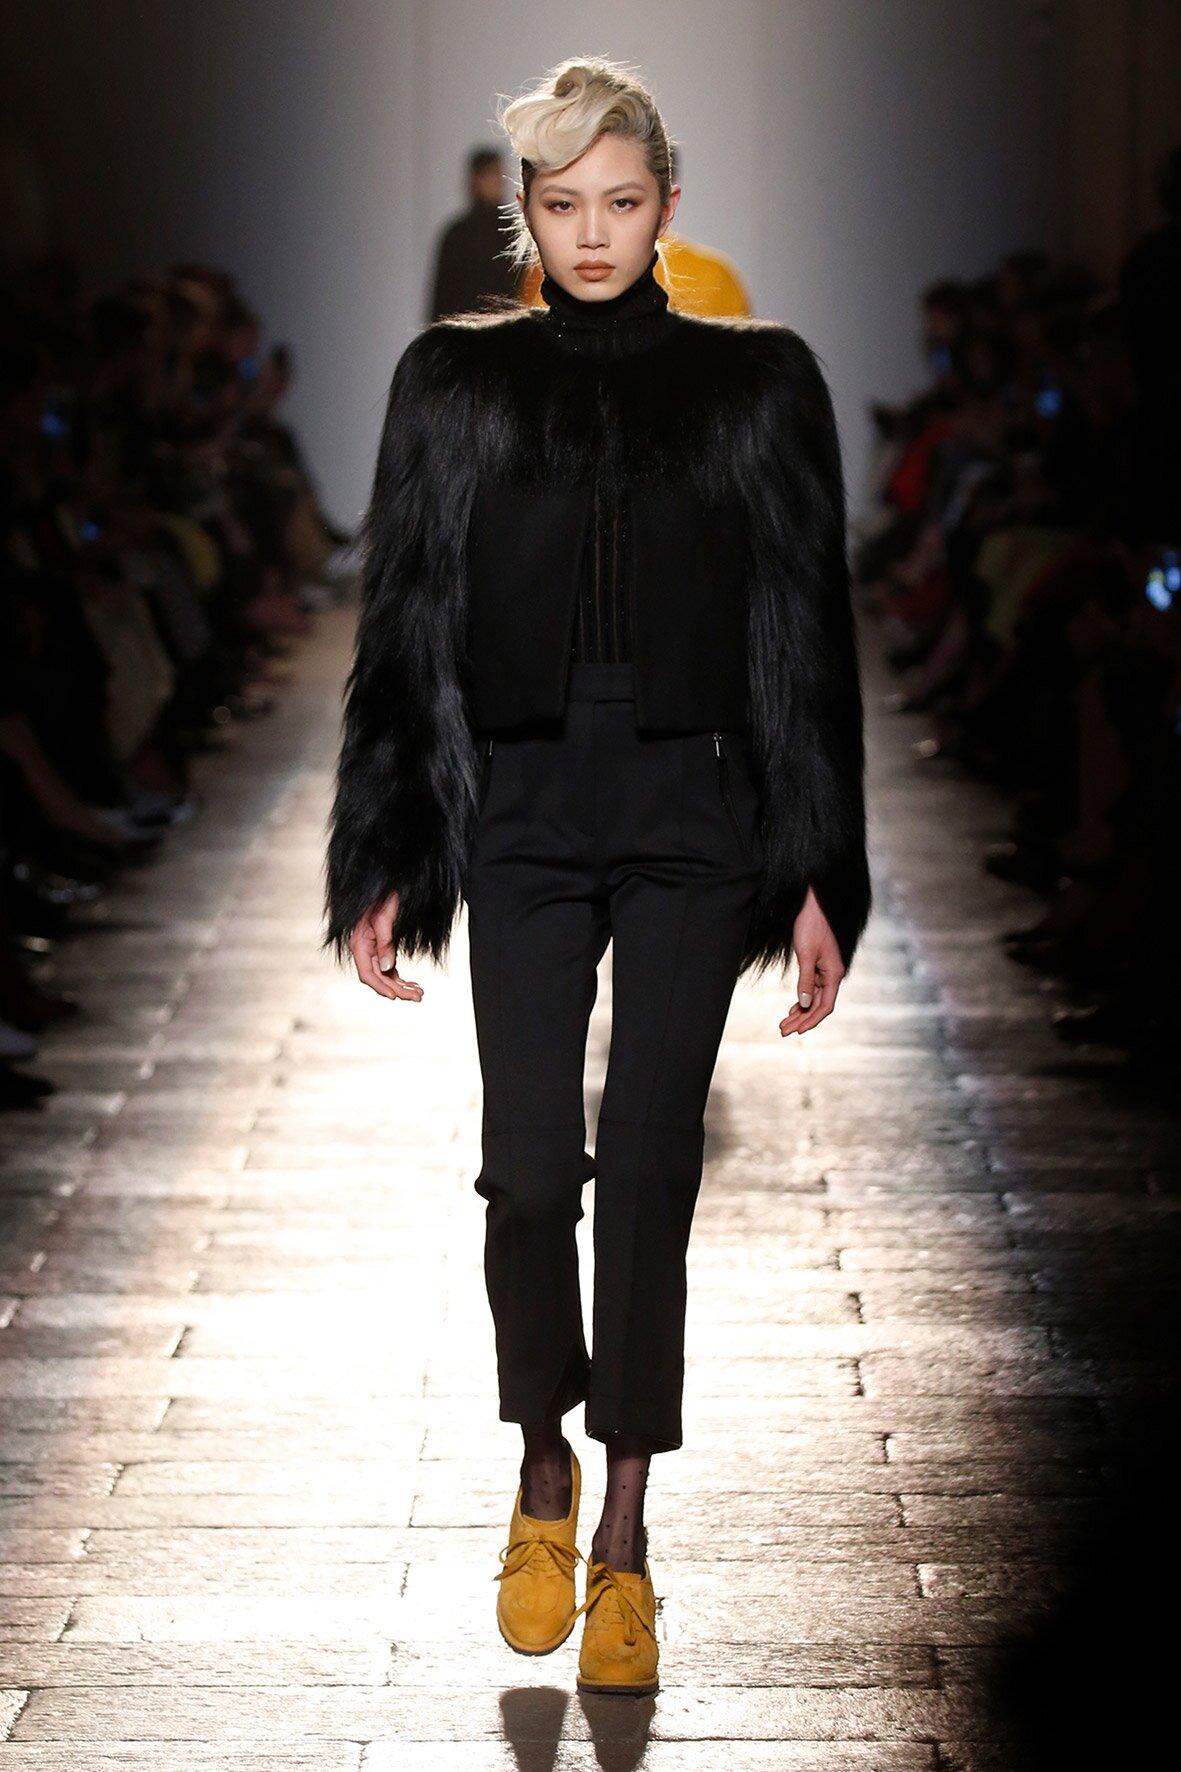 FW 2017-18 Bottega Veneta Woman Model